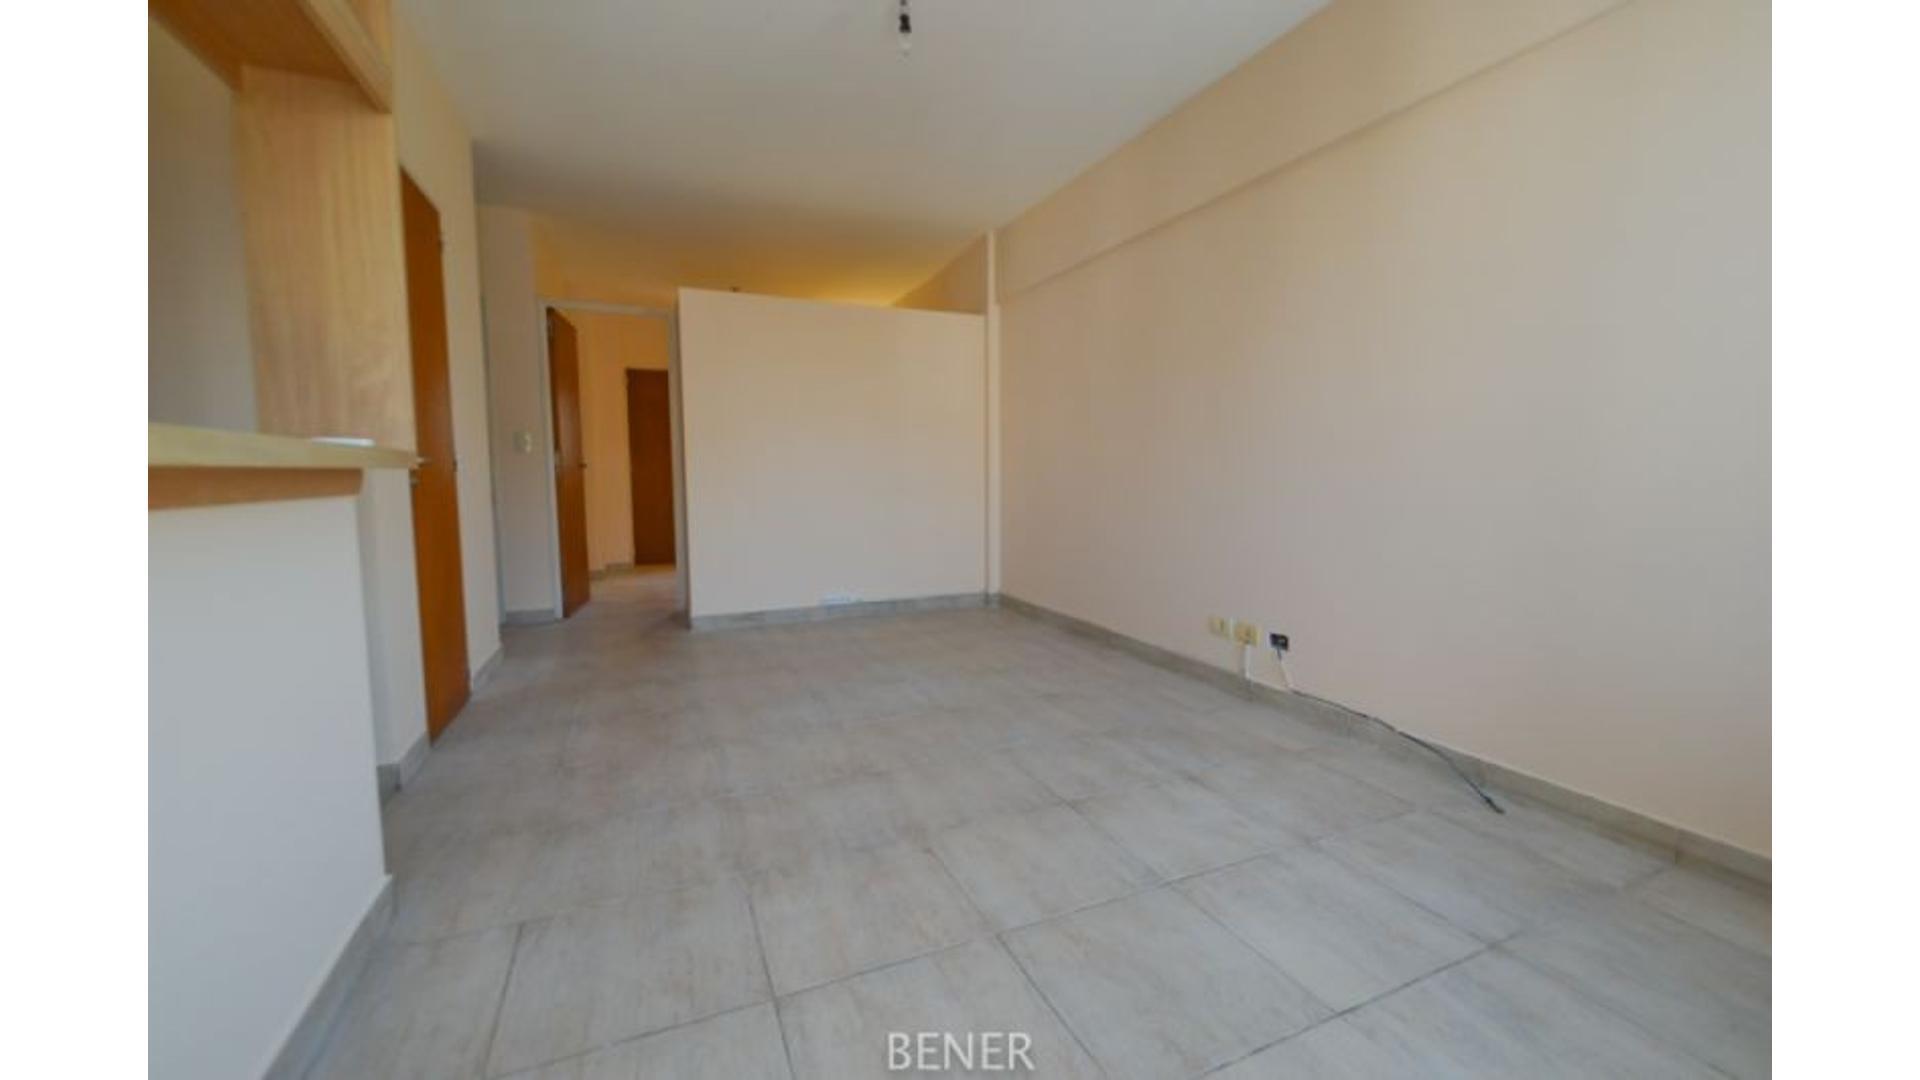 Departamento - Alquiler - Argentina, Capital Federal - DARREGUEYRA  AL 2400